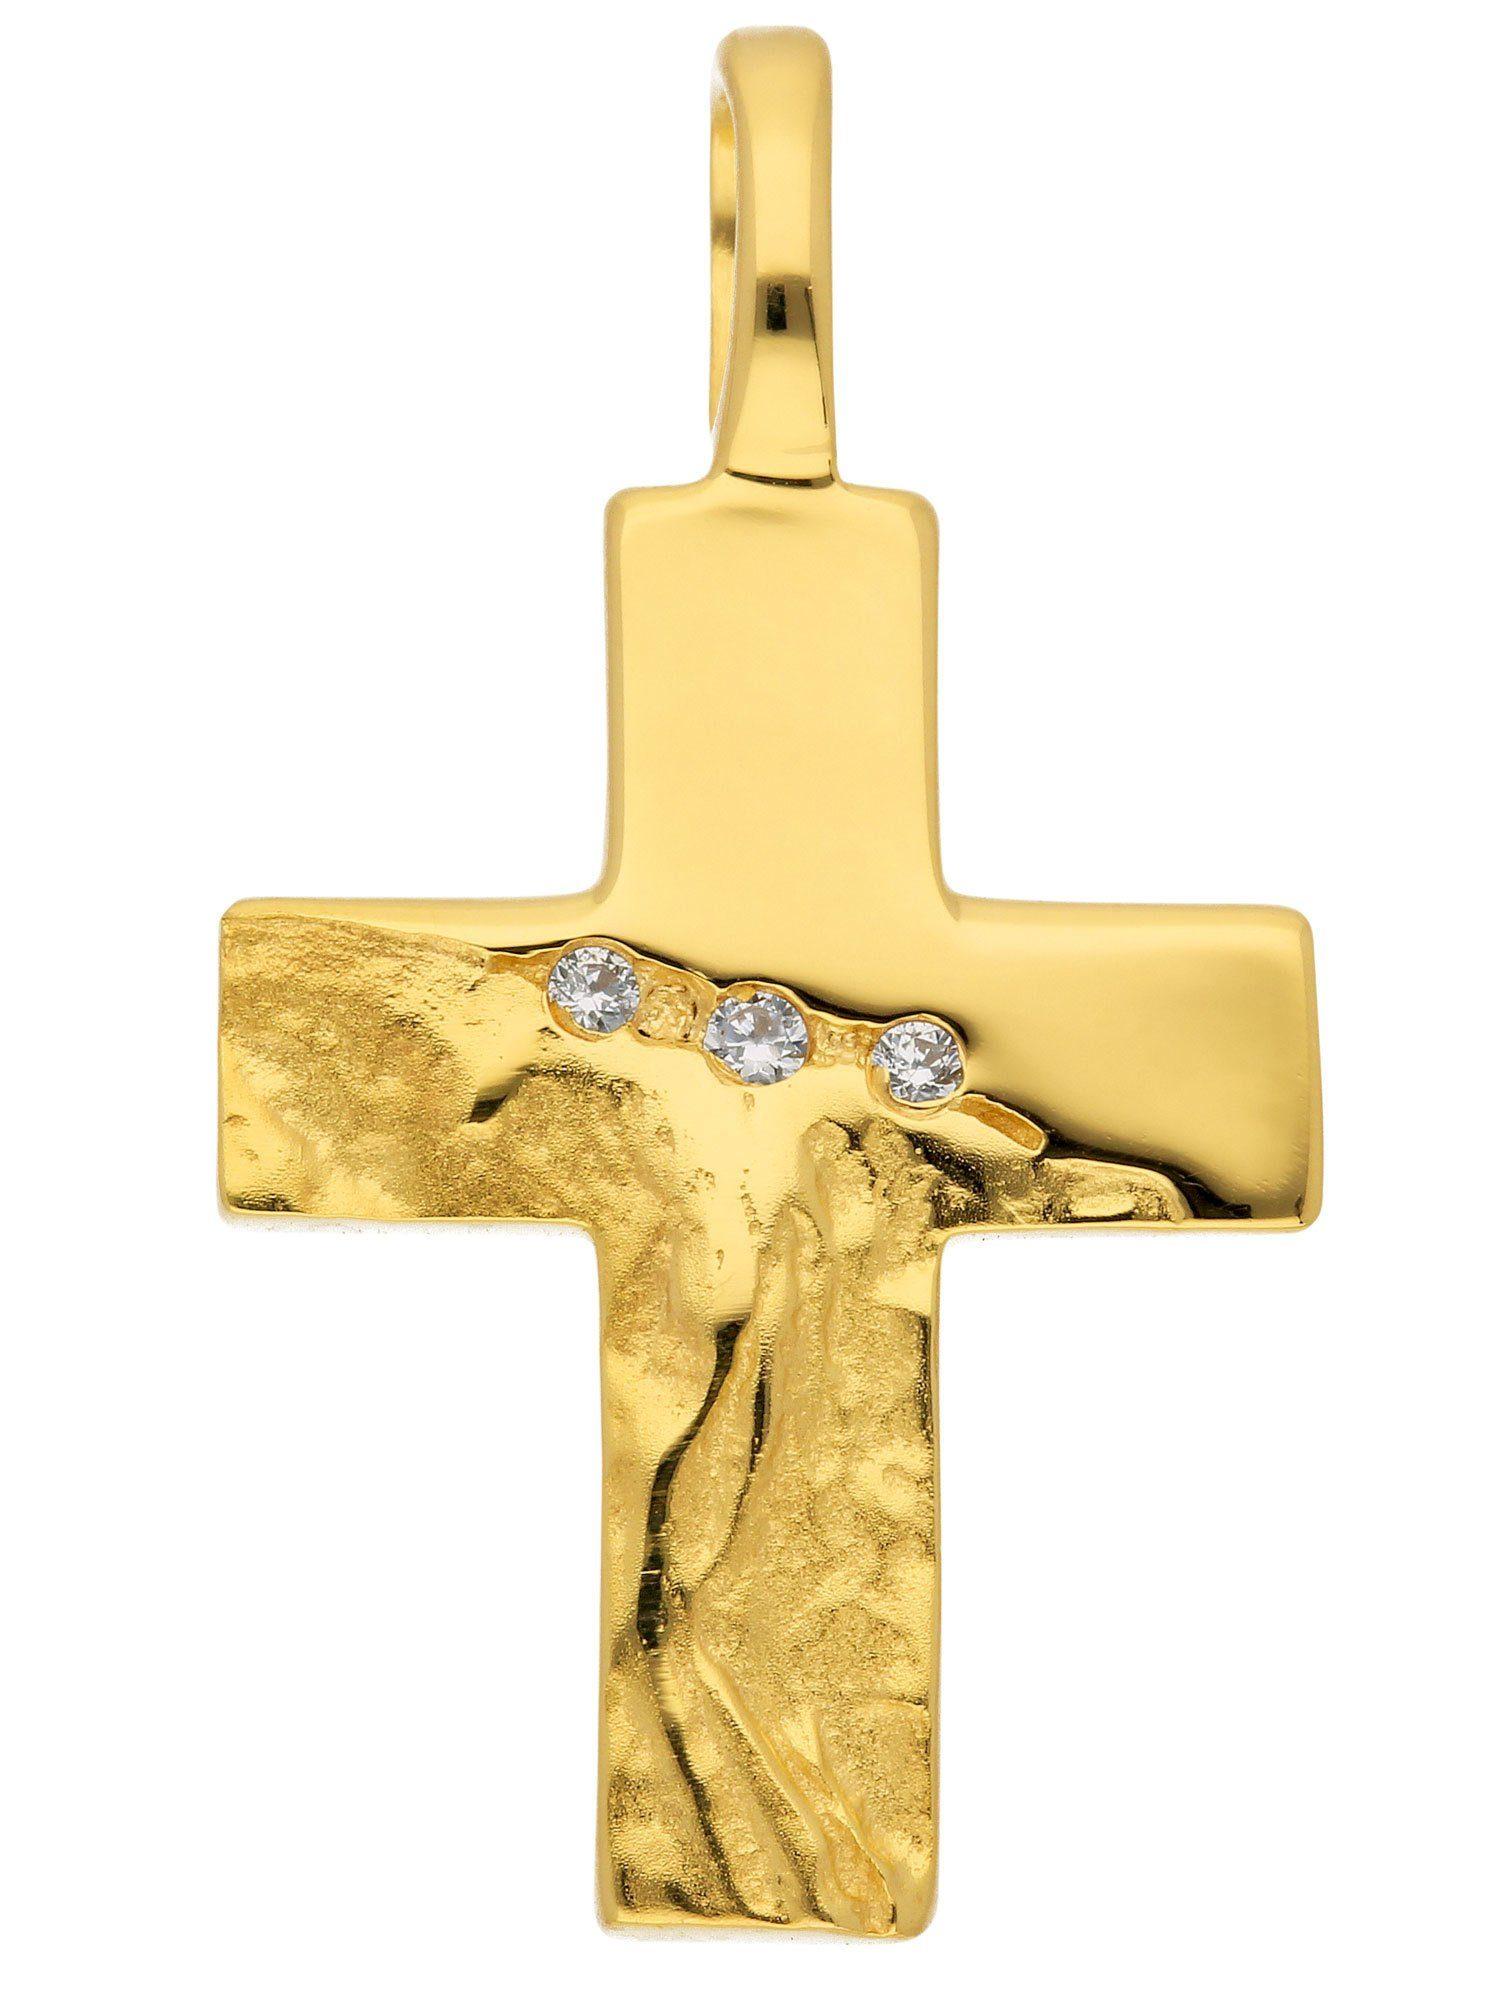 Adelia´s Kettenanhänger »Gold 8 k (333) Kreuz Anhänger« 8 k 333 Gelbgold mit Zirkonia